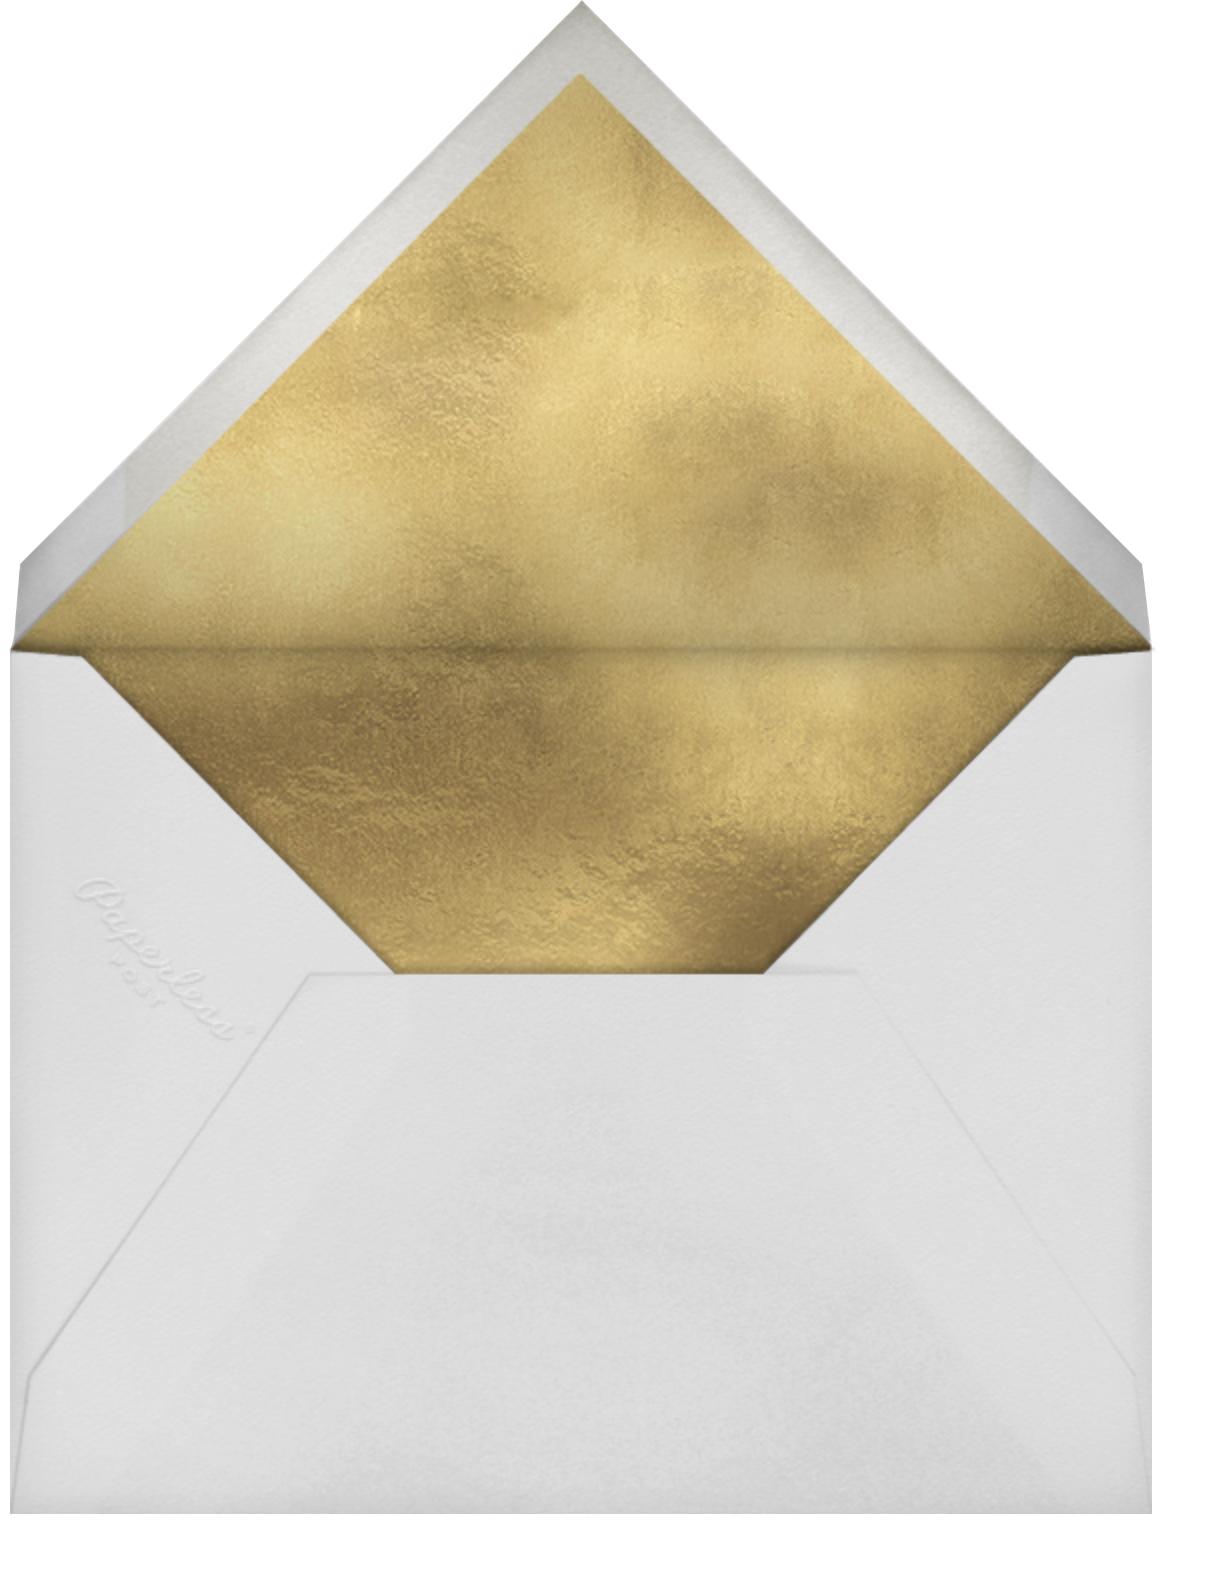 Fionola - Paperless Post - Wedding postponement - envelope back